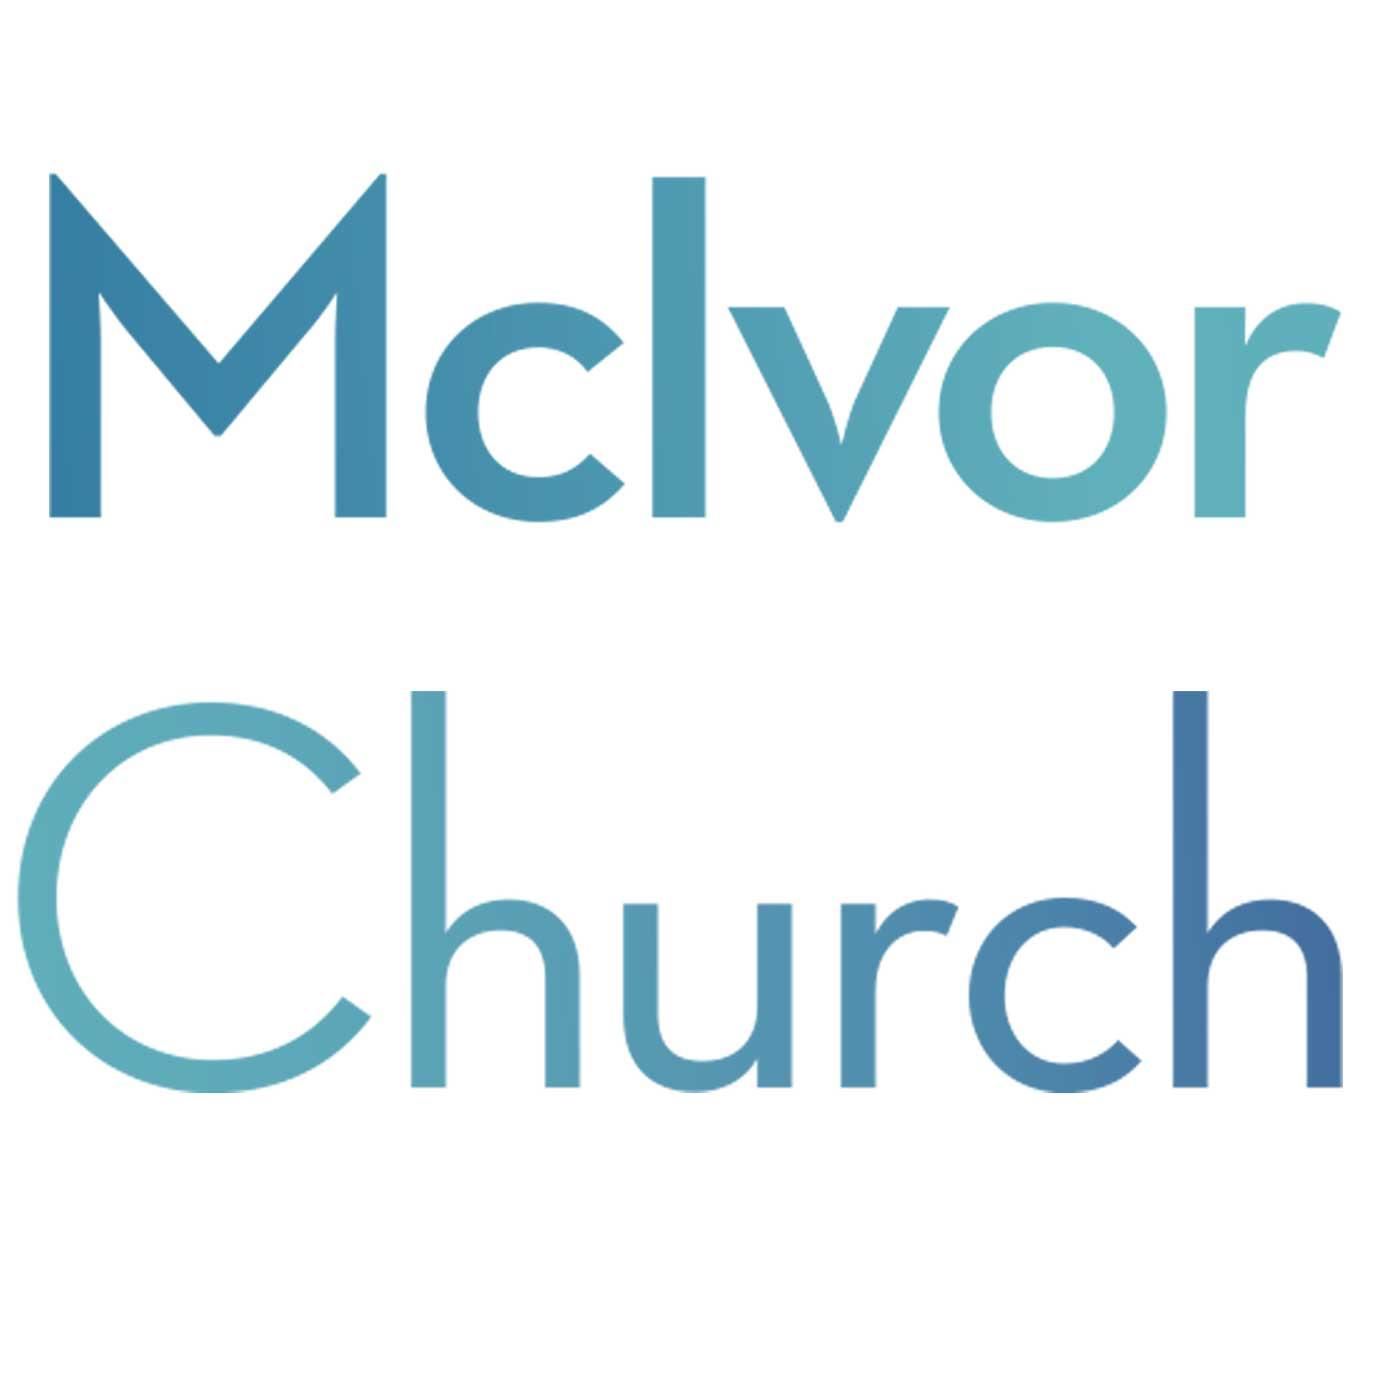 McIvor Church's Weekly Sermons